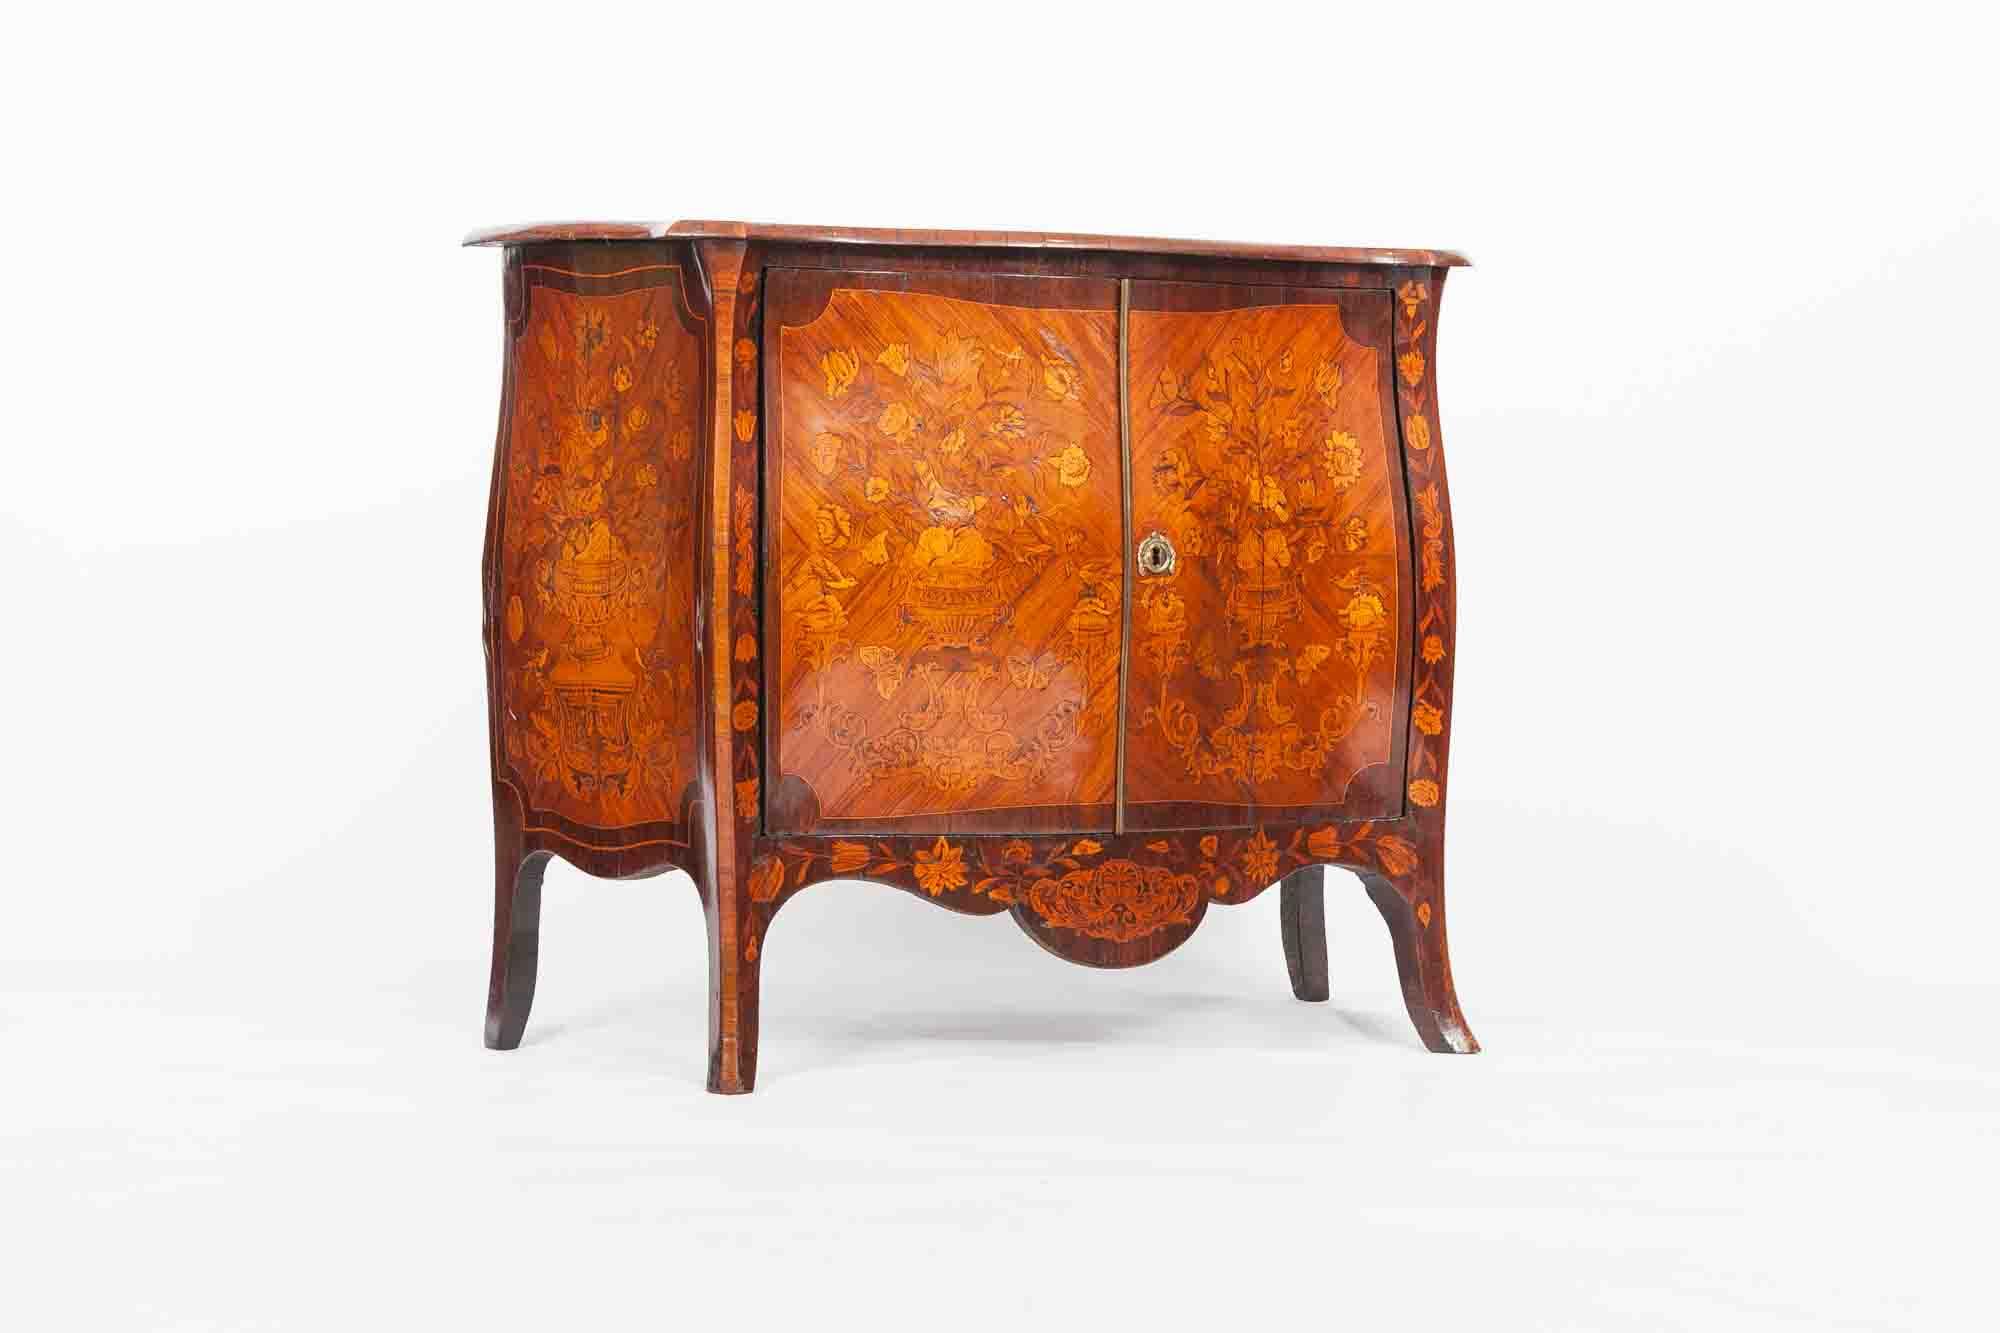 Bombe 94 dedans 9425 18th century dutch marquetry bombe commode - o'sullivan antiques